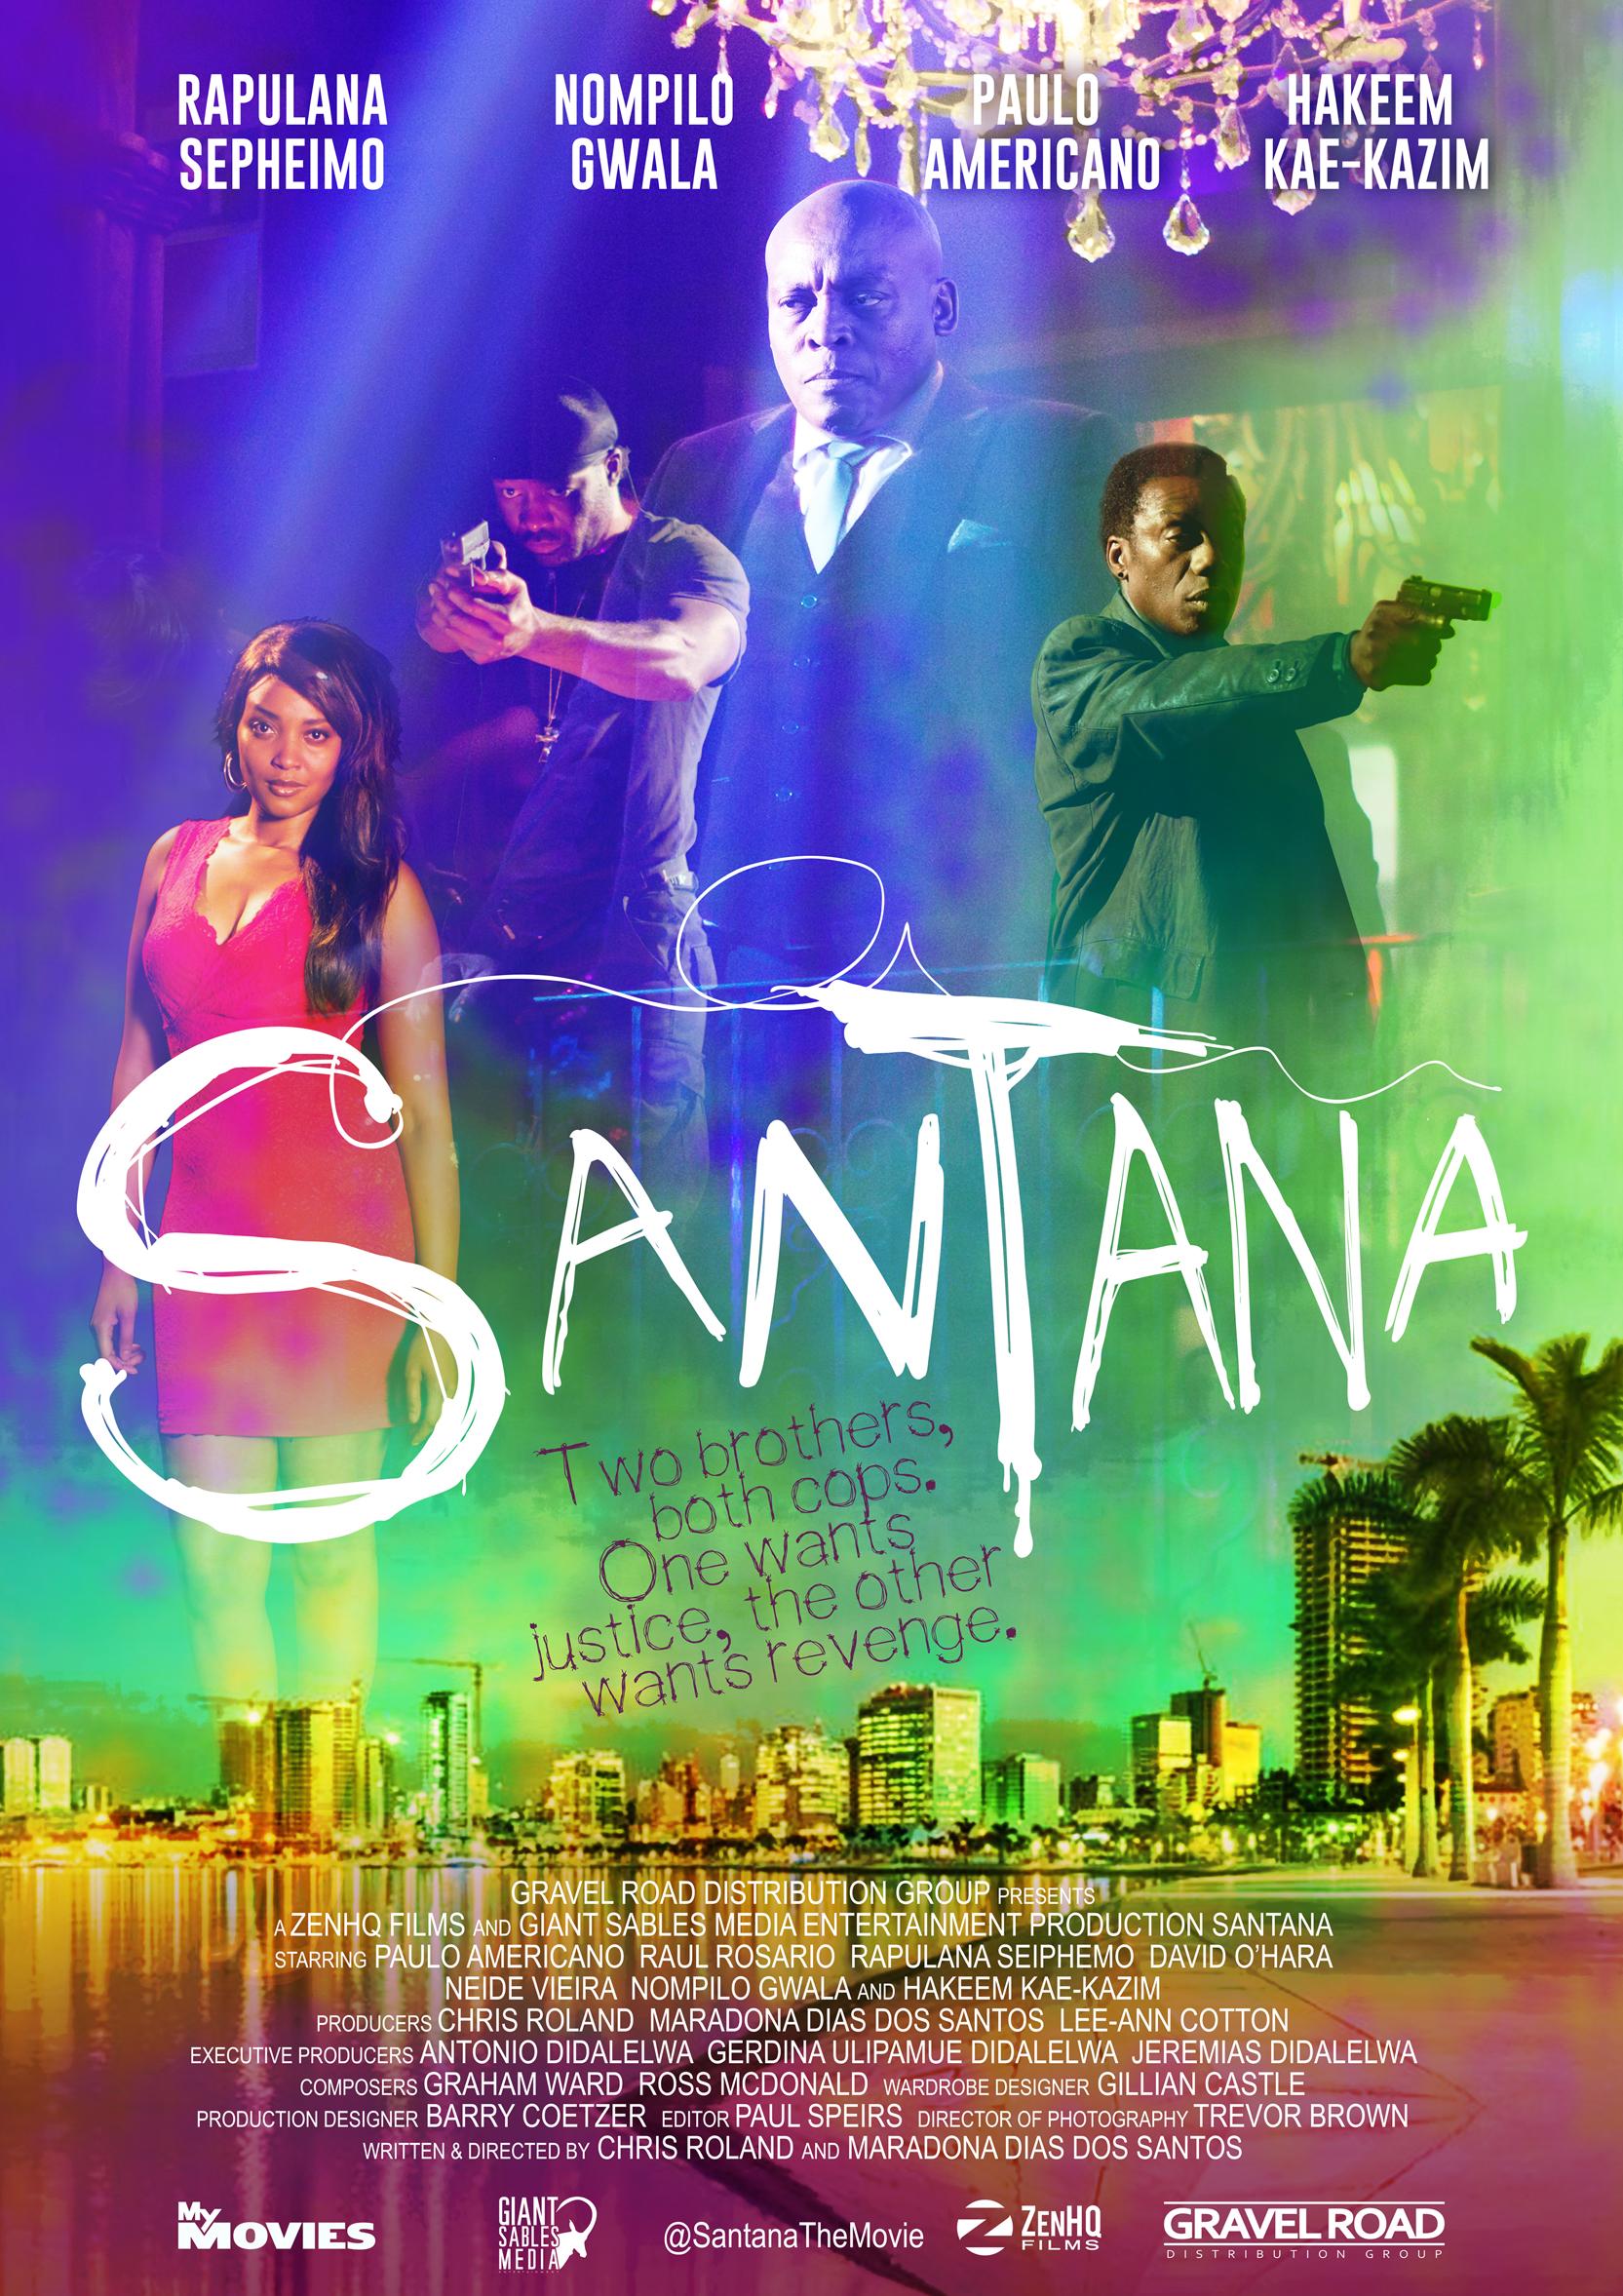 Santana hd on soap2day